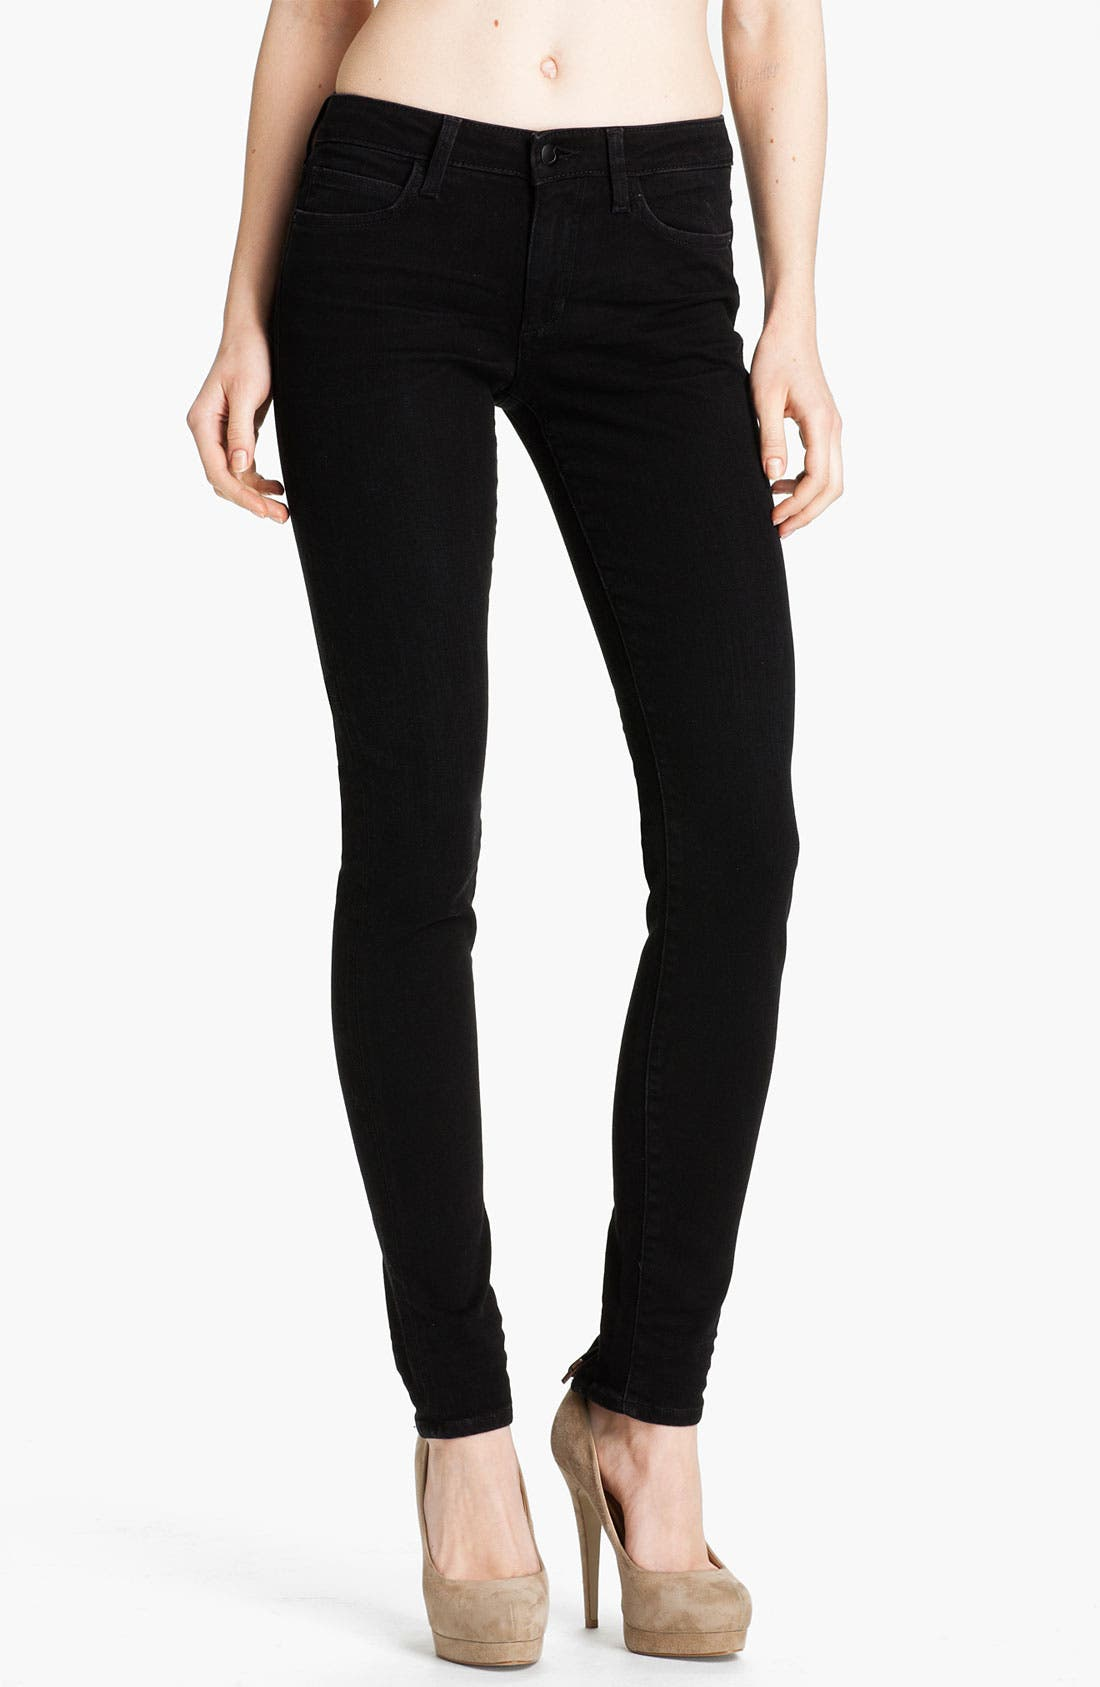 Main Image - Joe's Ankle Zip Skinny Jeans (Norah Black)